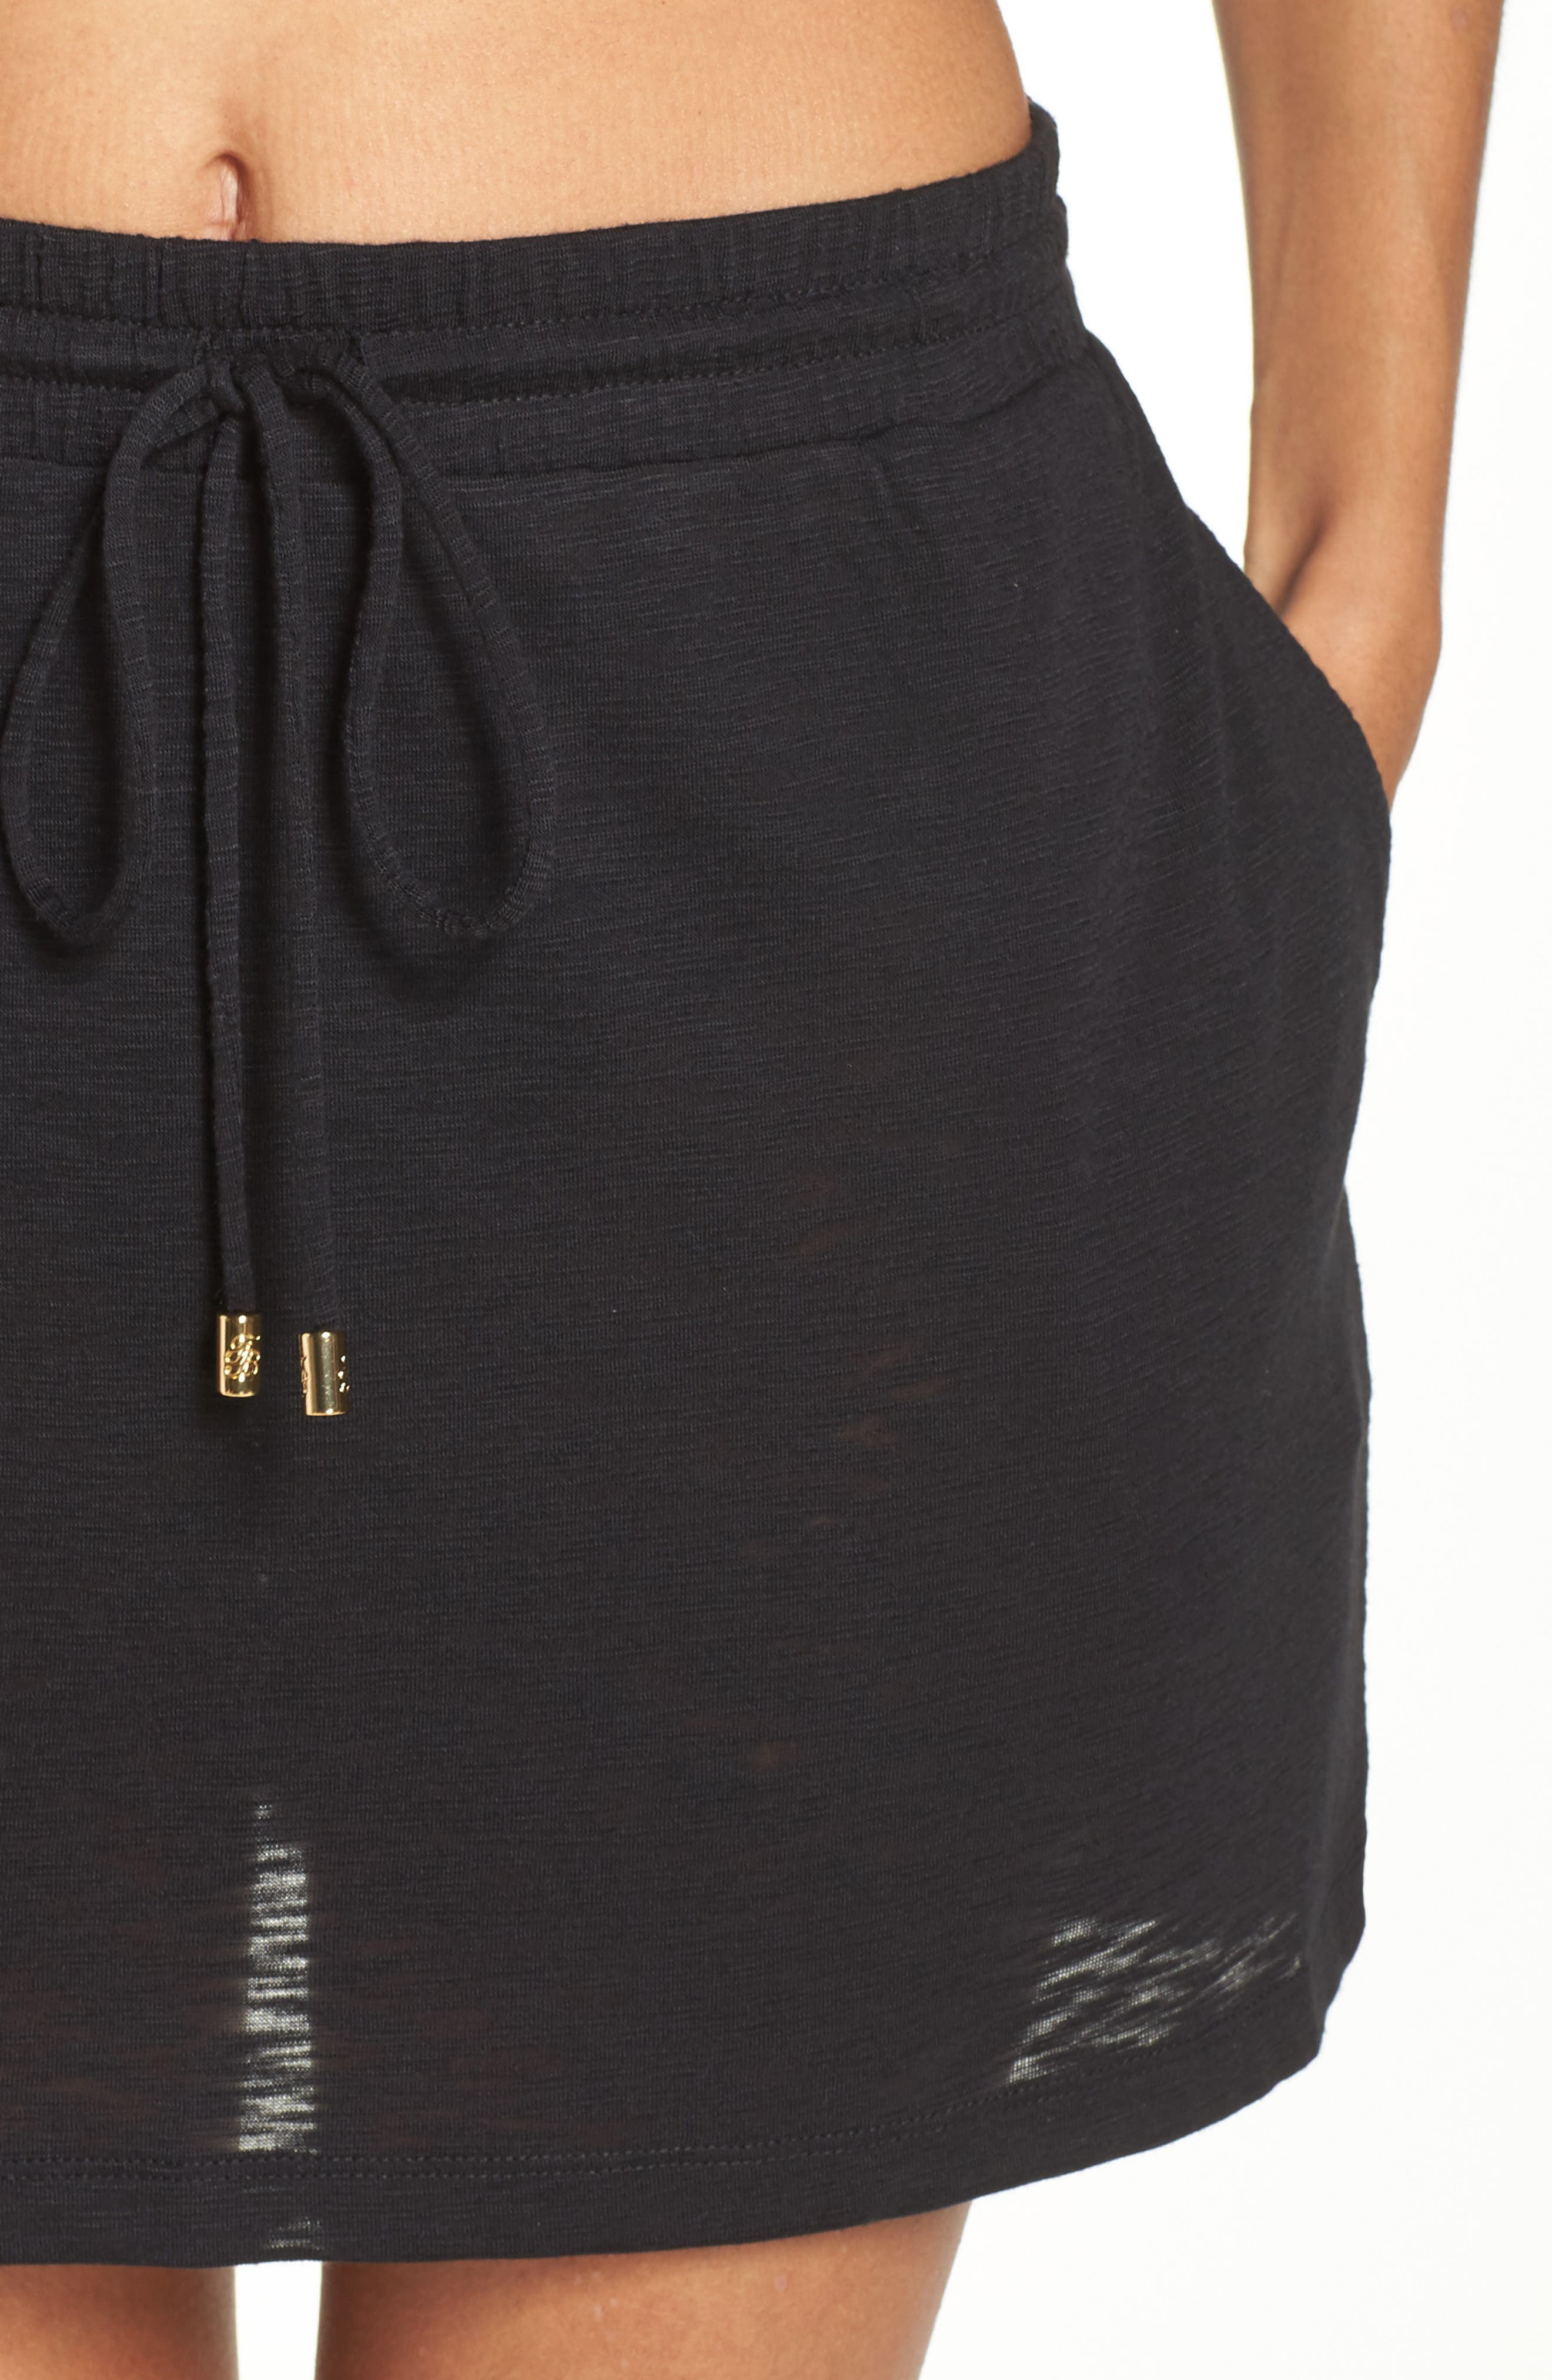 TOMMY BAHAMA,                             Cover-Up Skirt,                             Alternate thumbnail 4, color,                             BLACK